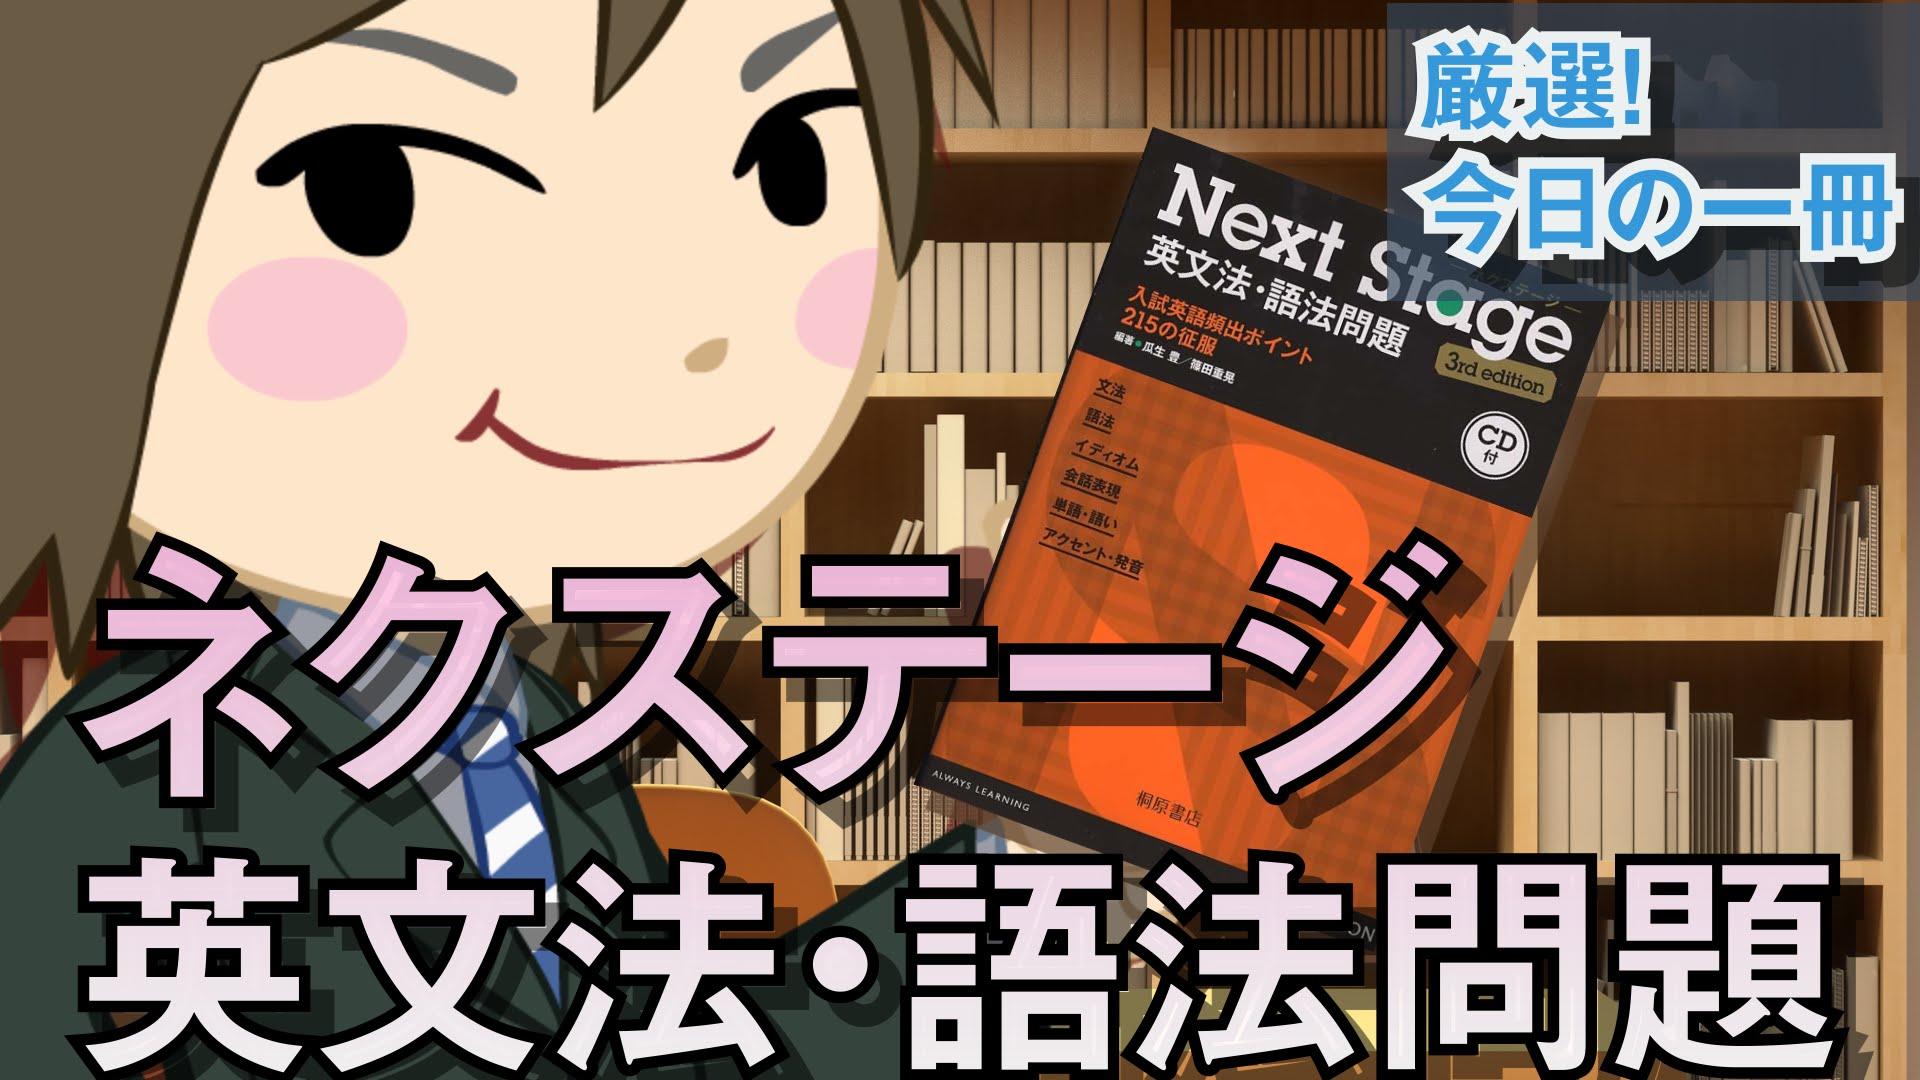 Next Stage(ネクステージ) 英文法・語法問題|今日の一冊